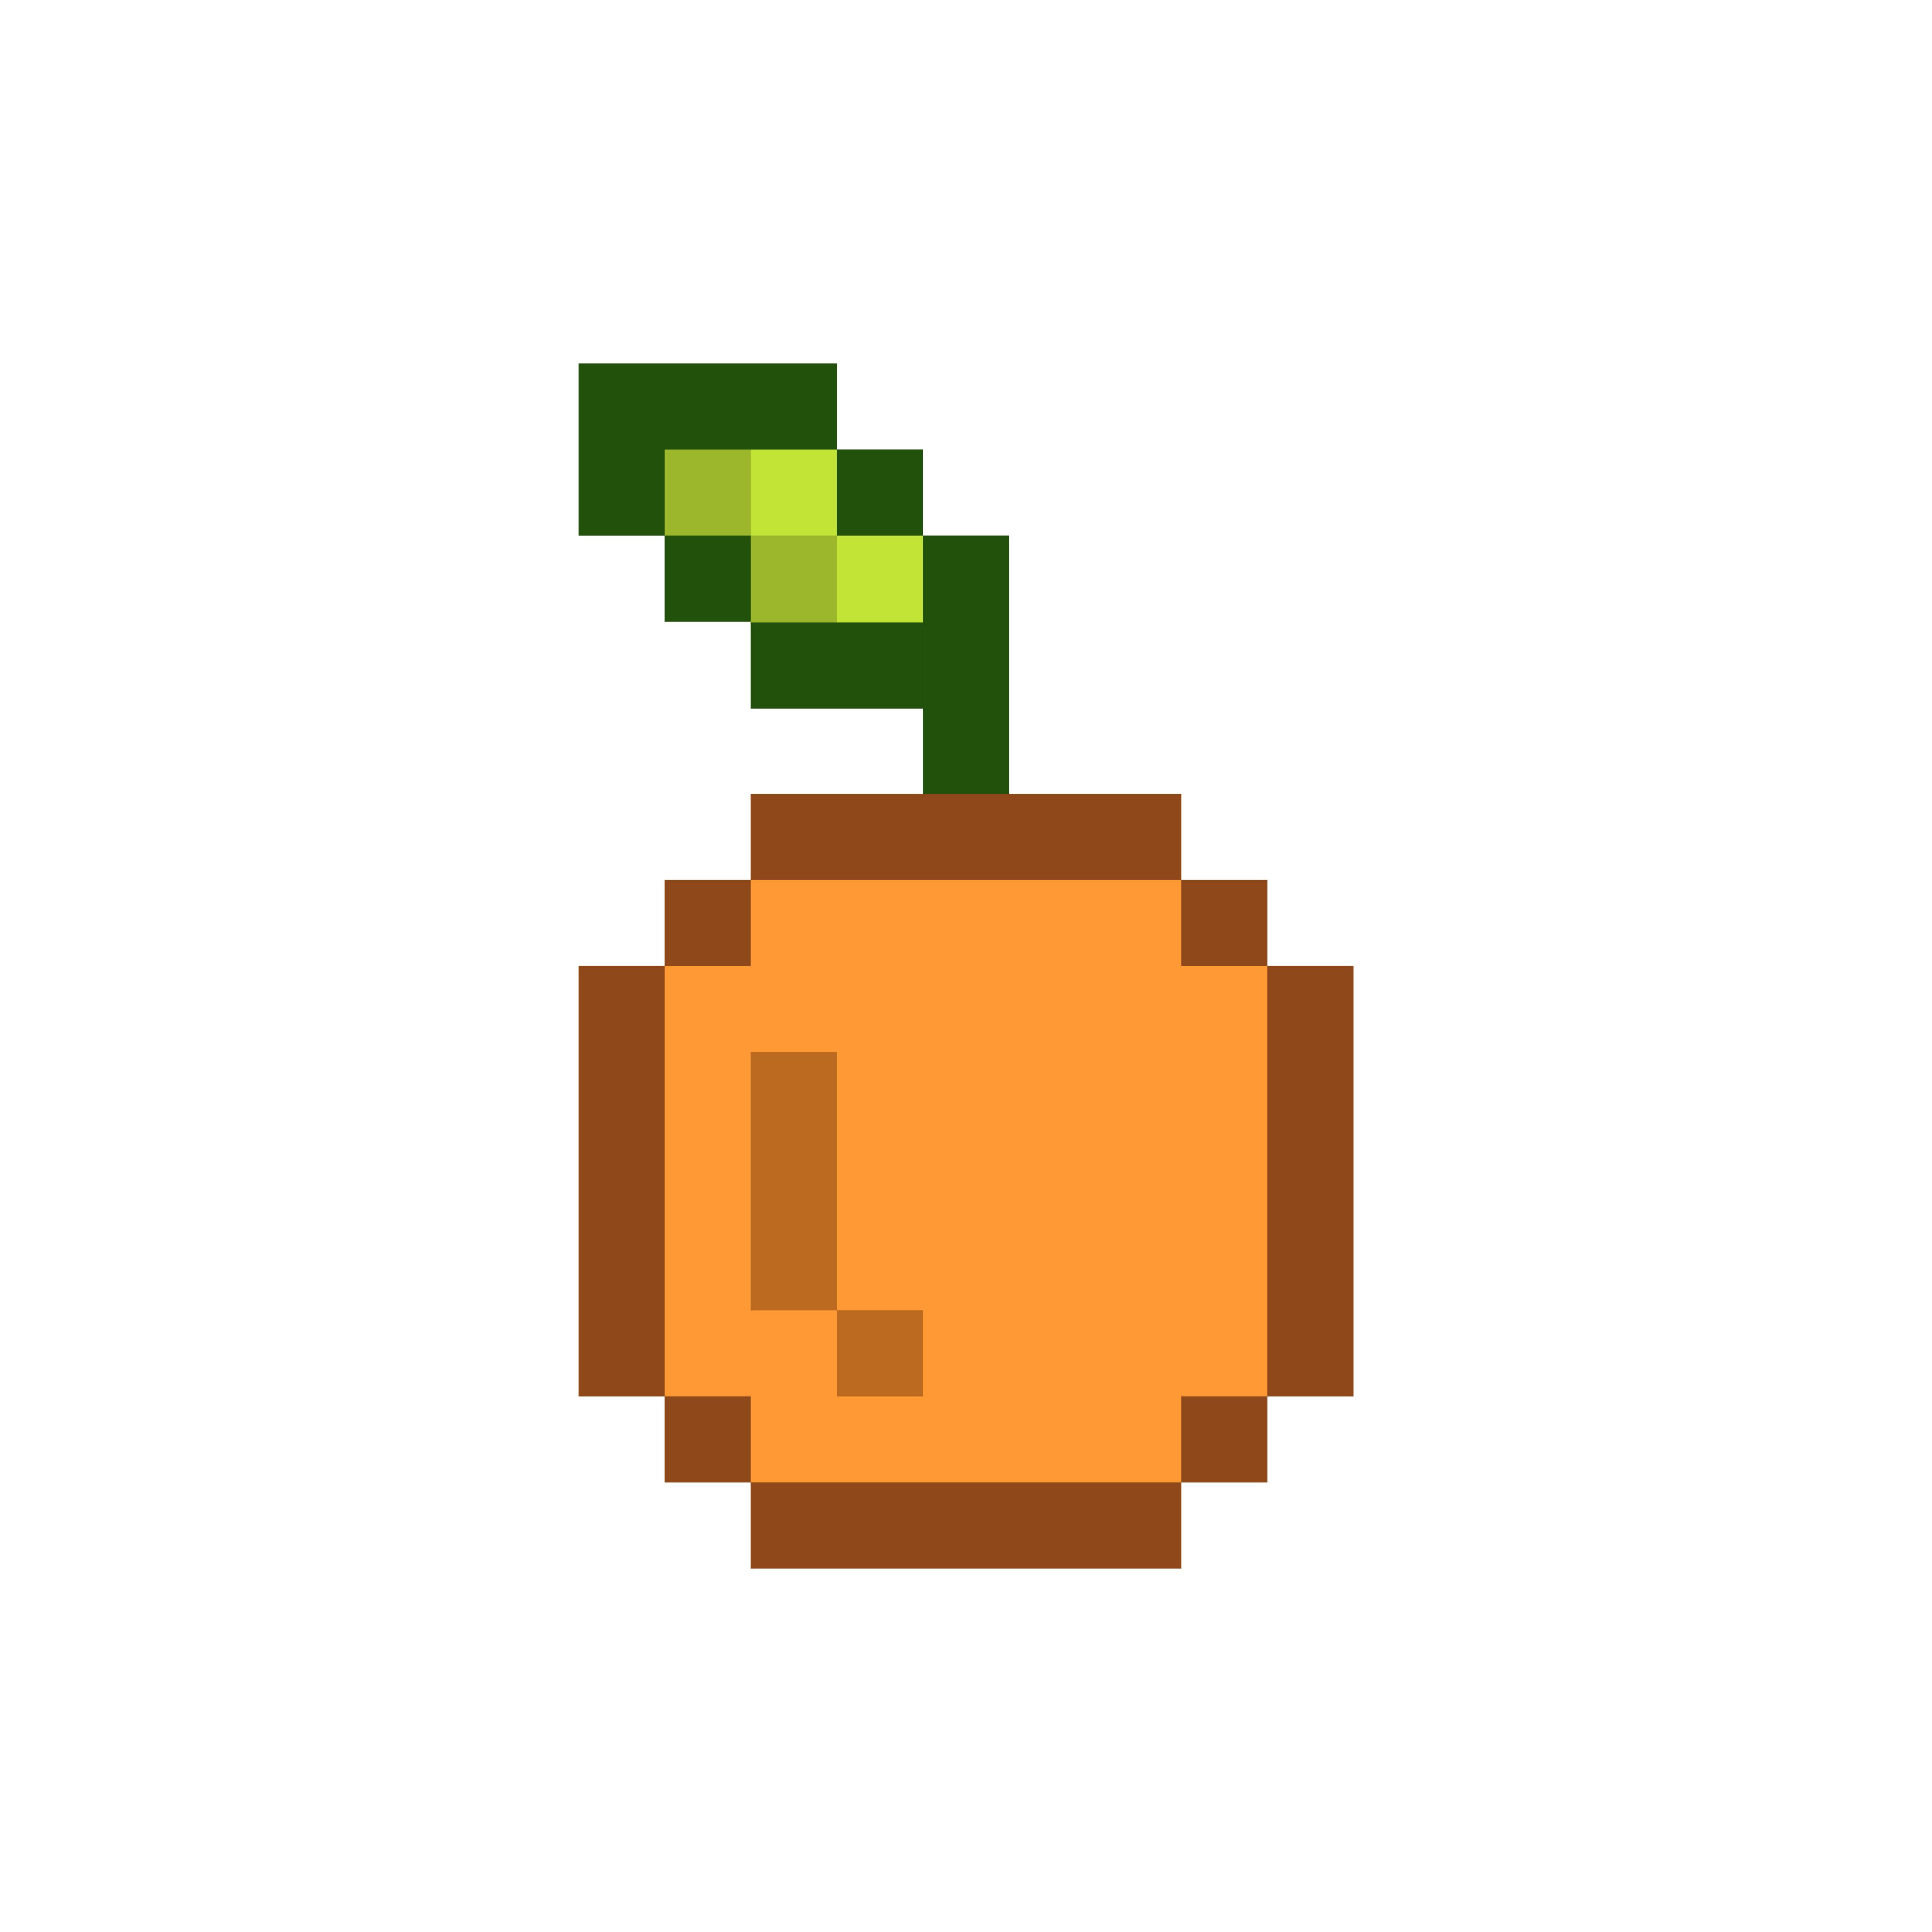 An Orange Pixelated Fruit Graphic